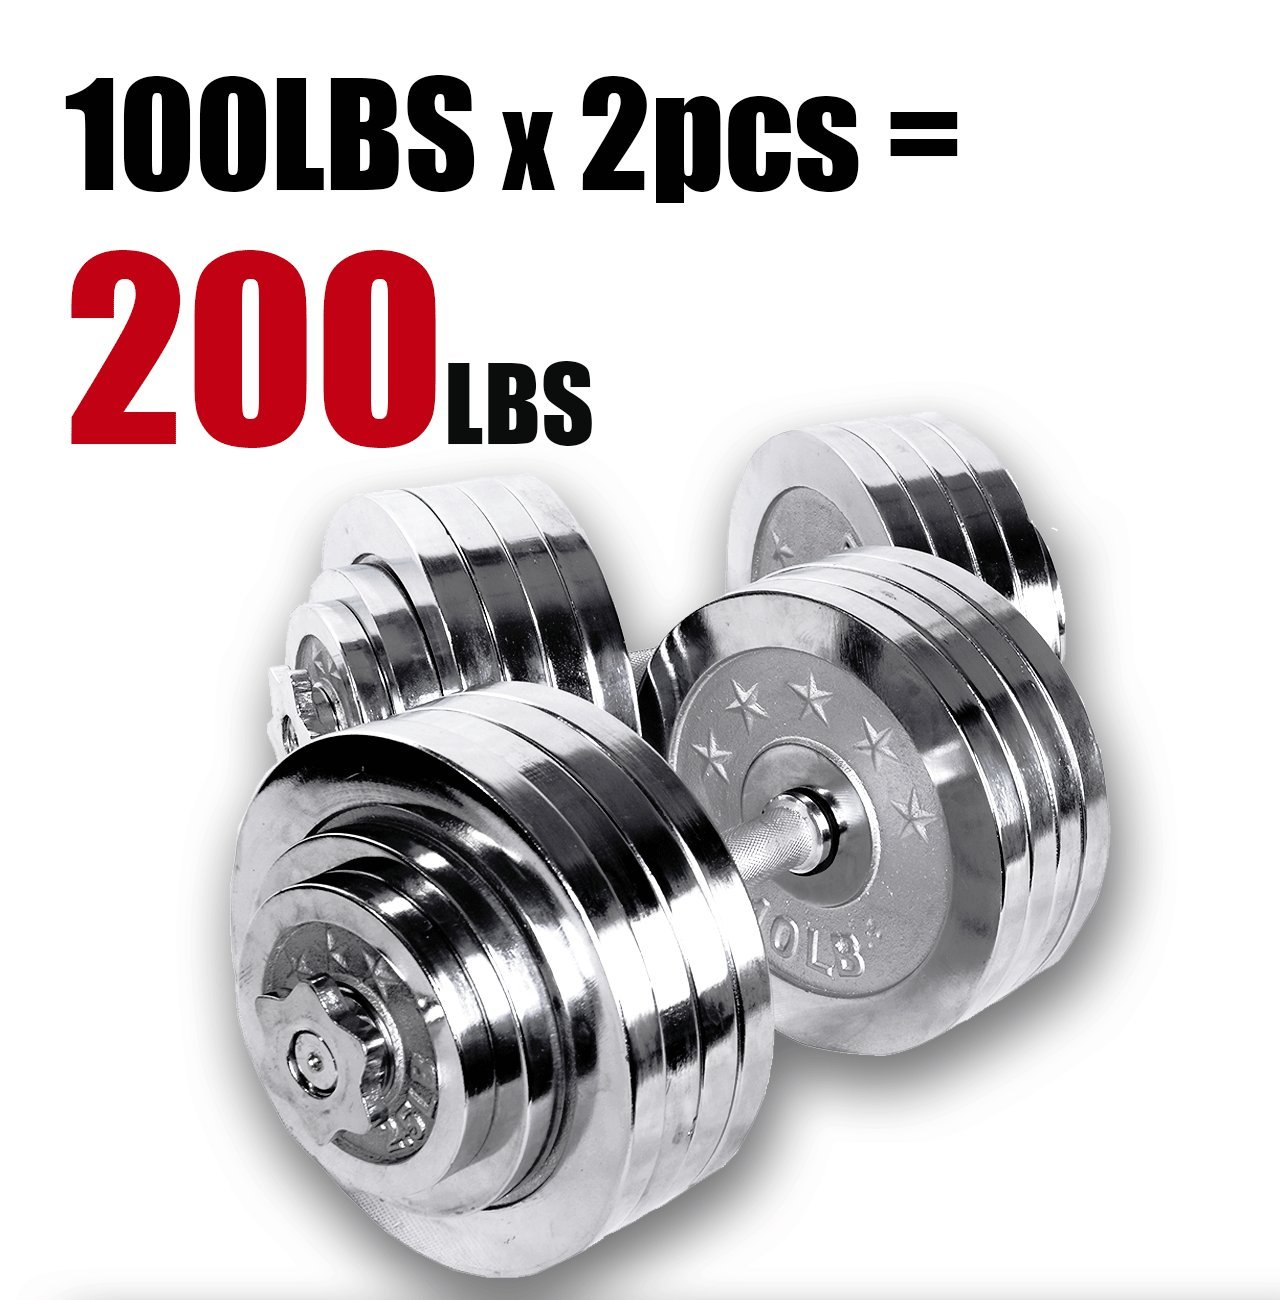 Ringstar Starring 105-200 Lbs adjustable dumbbells (200 LBS Silver)